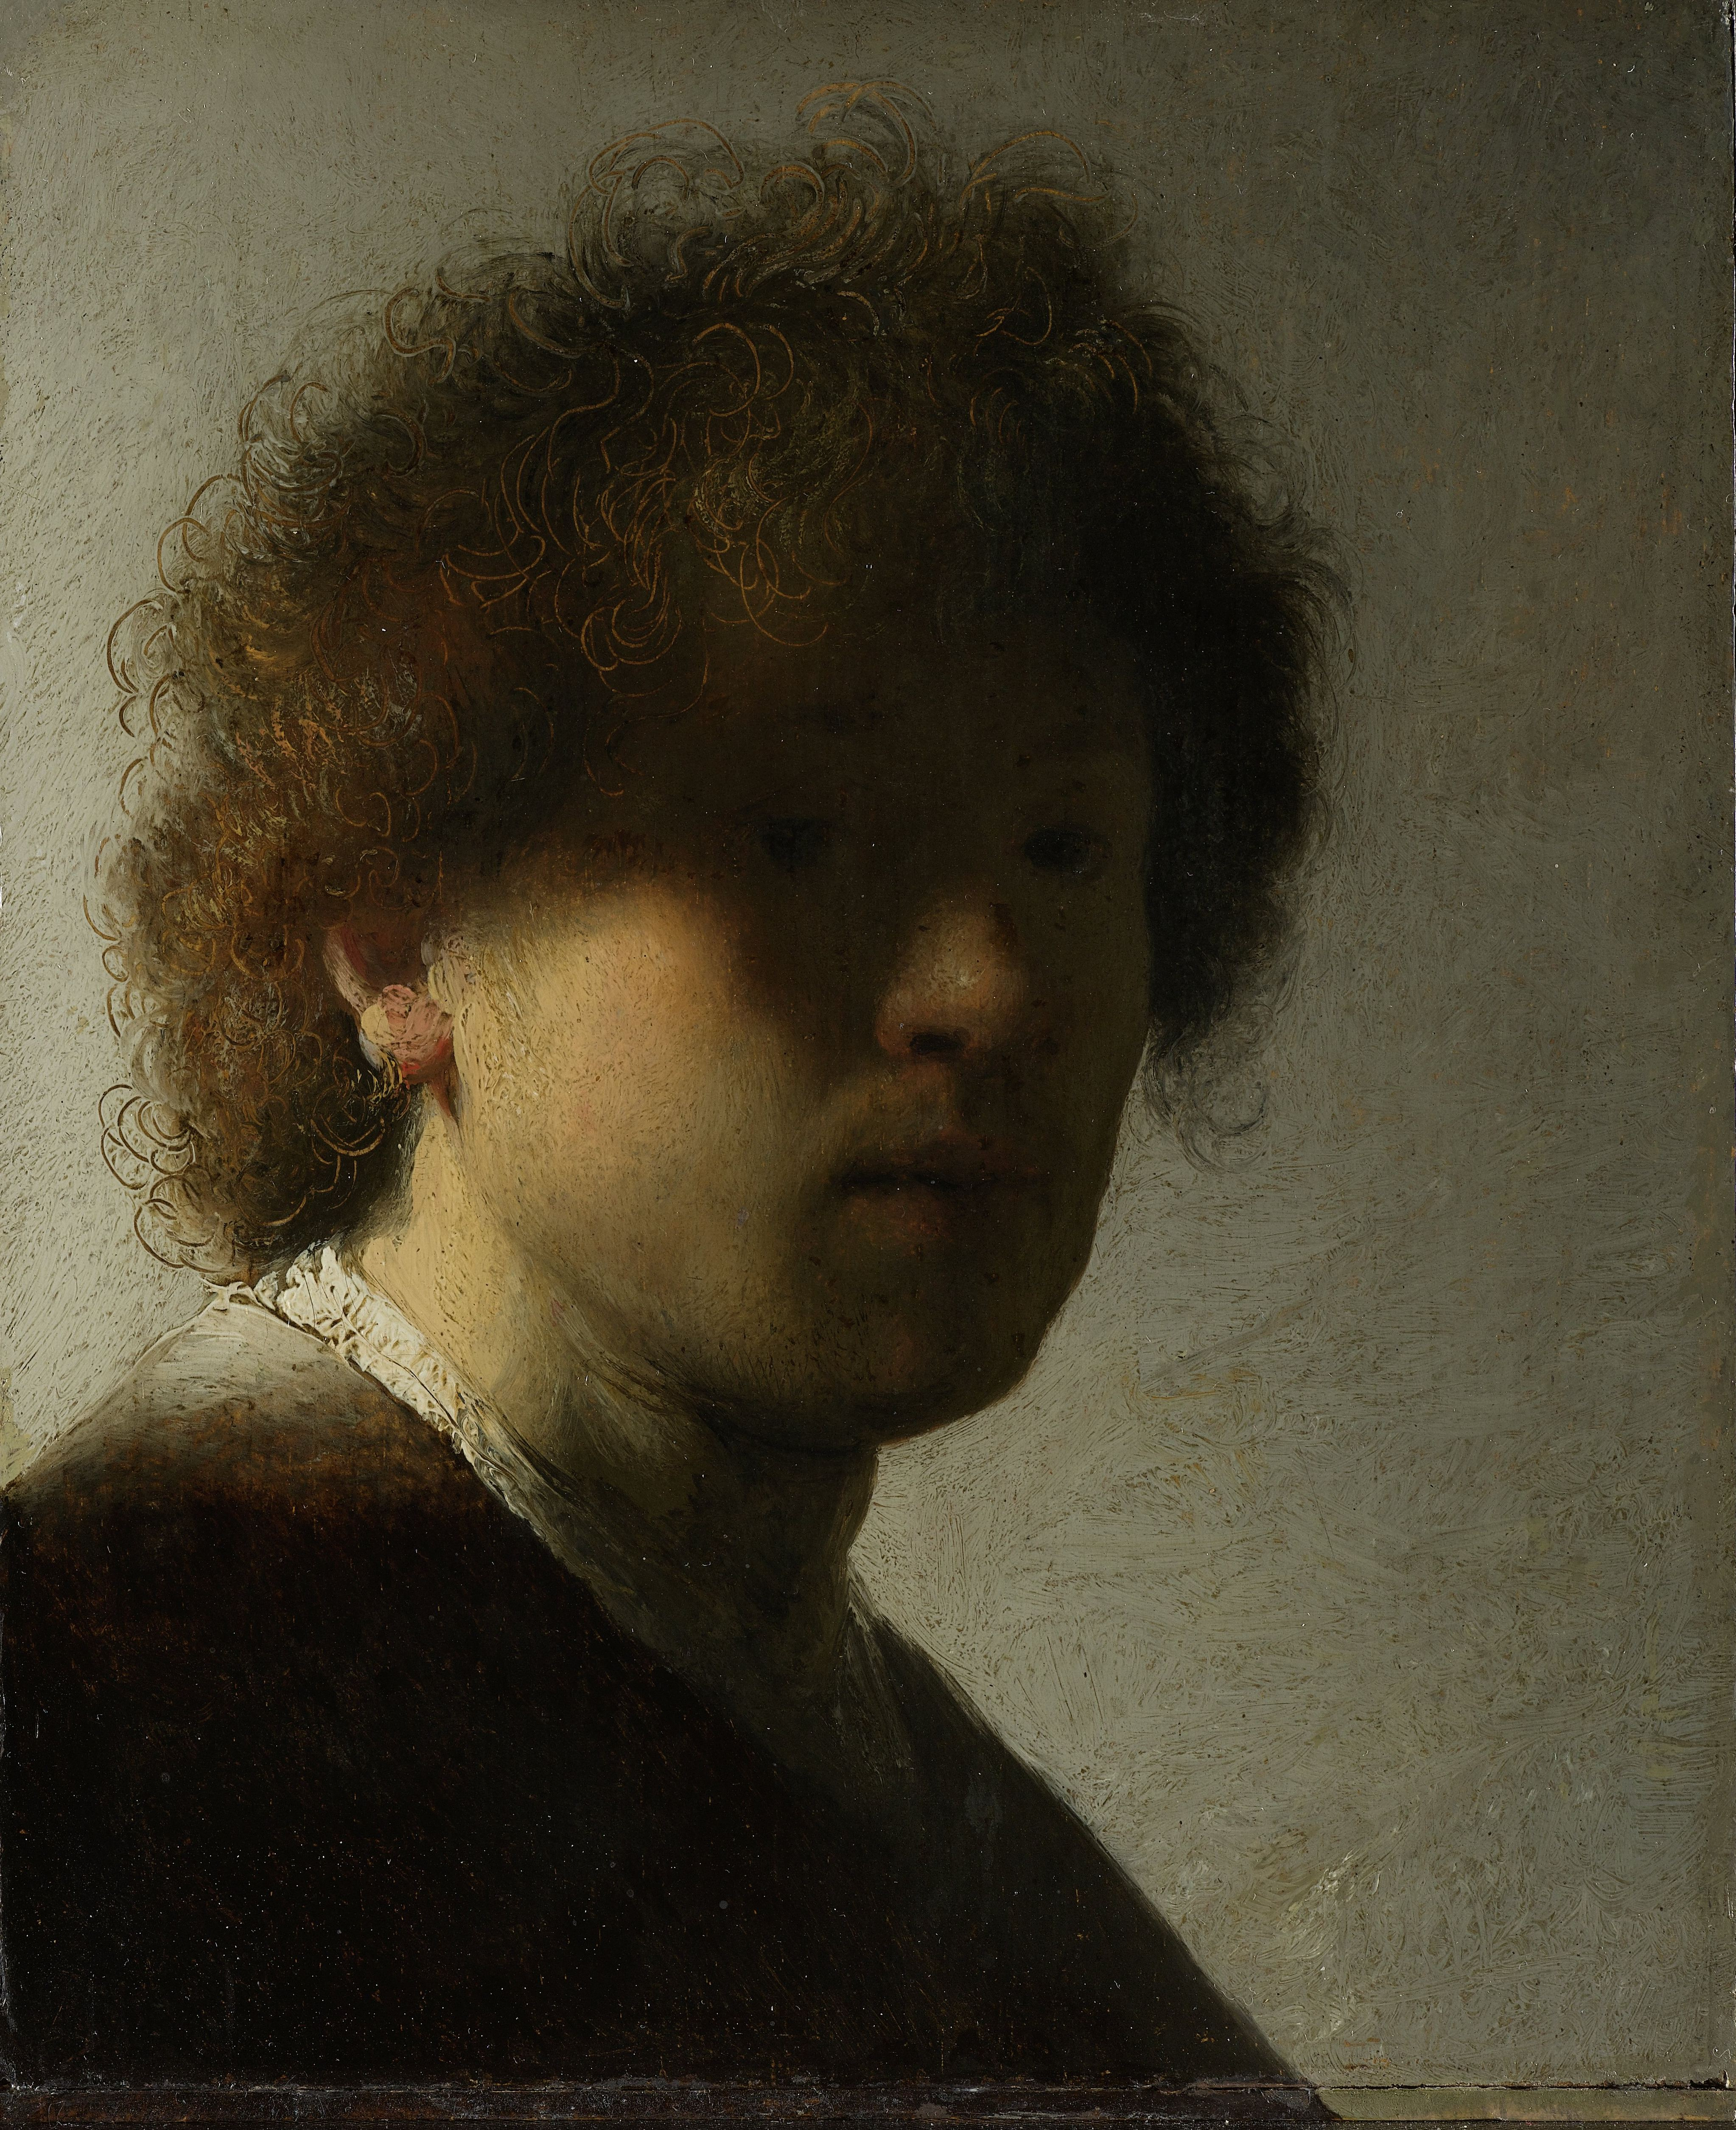 Young Rembrandt Self-Portrait | VanGoYourself